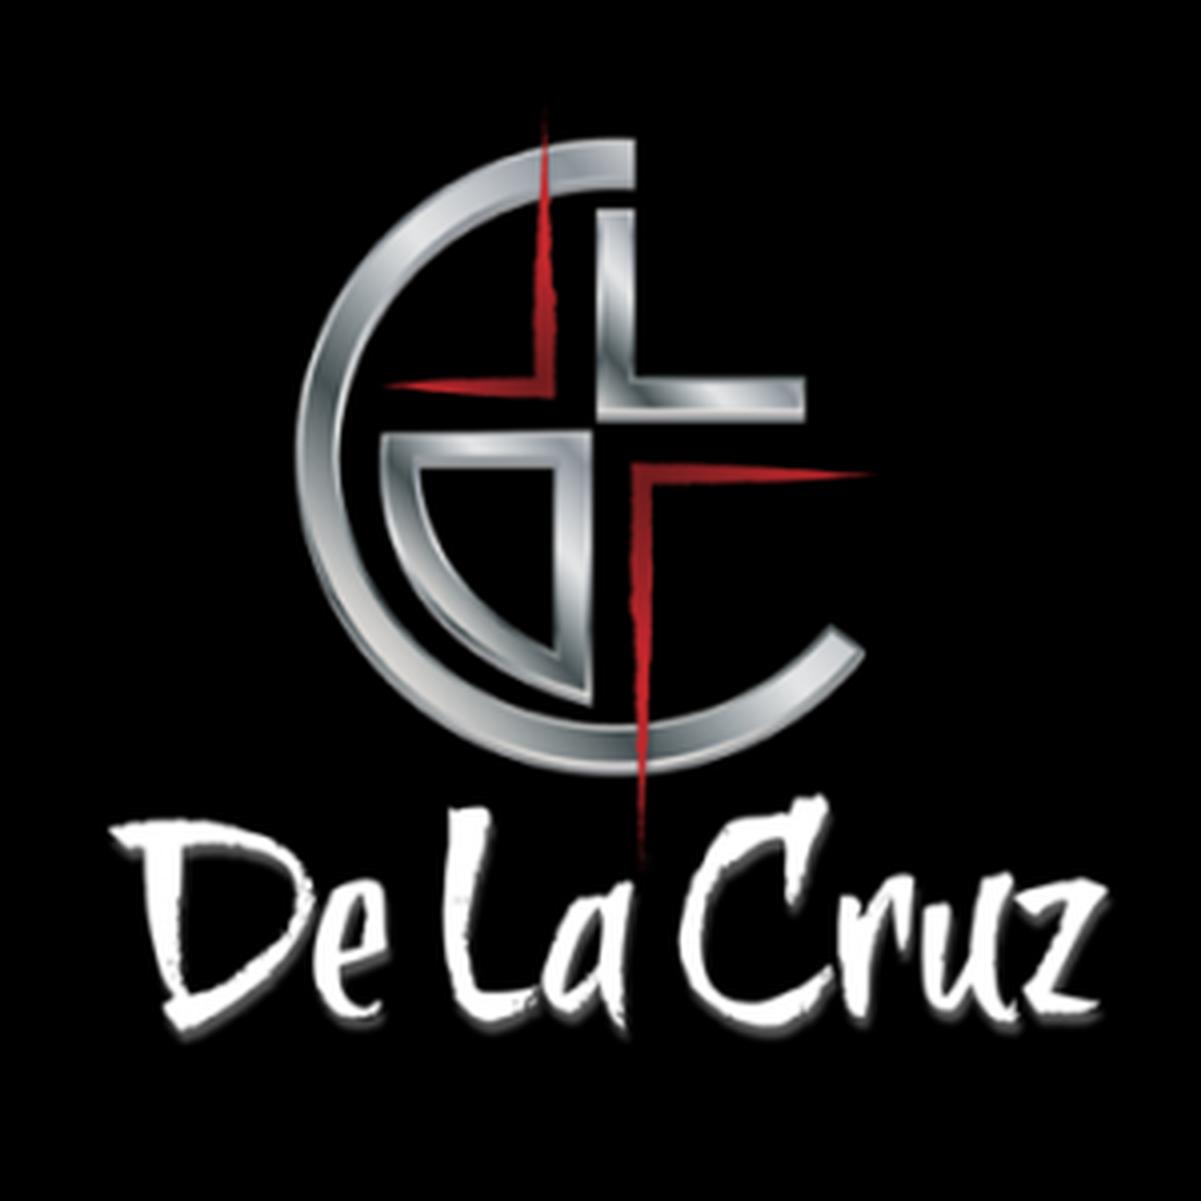 Aaron DeLaCruz Band